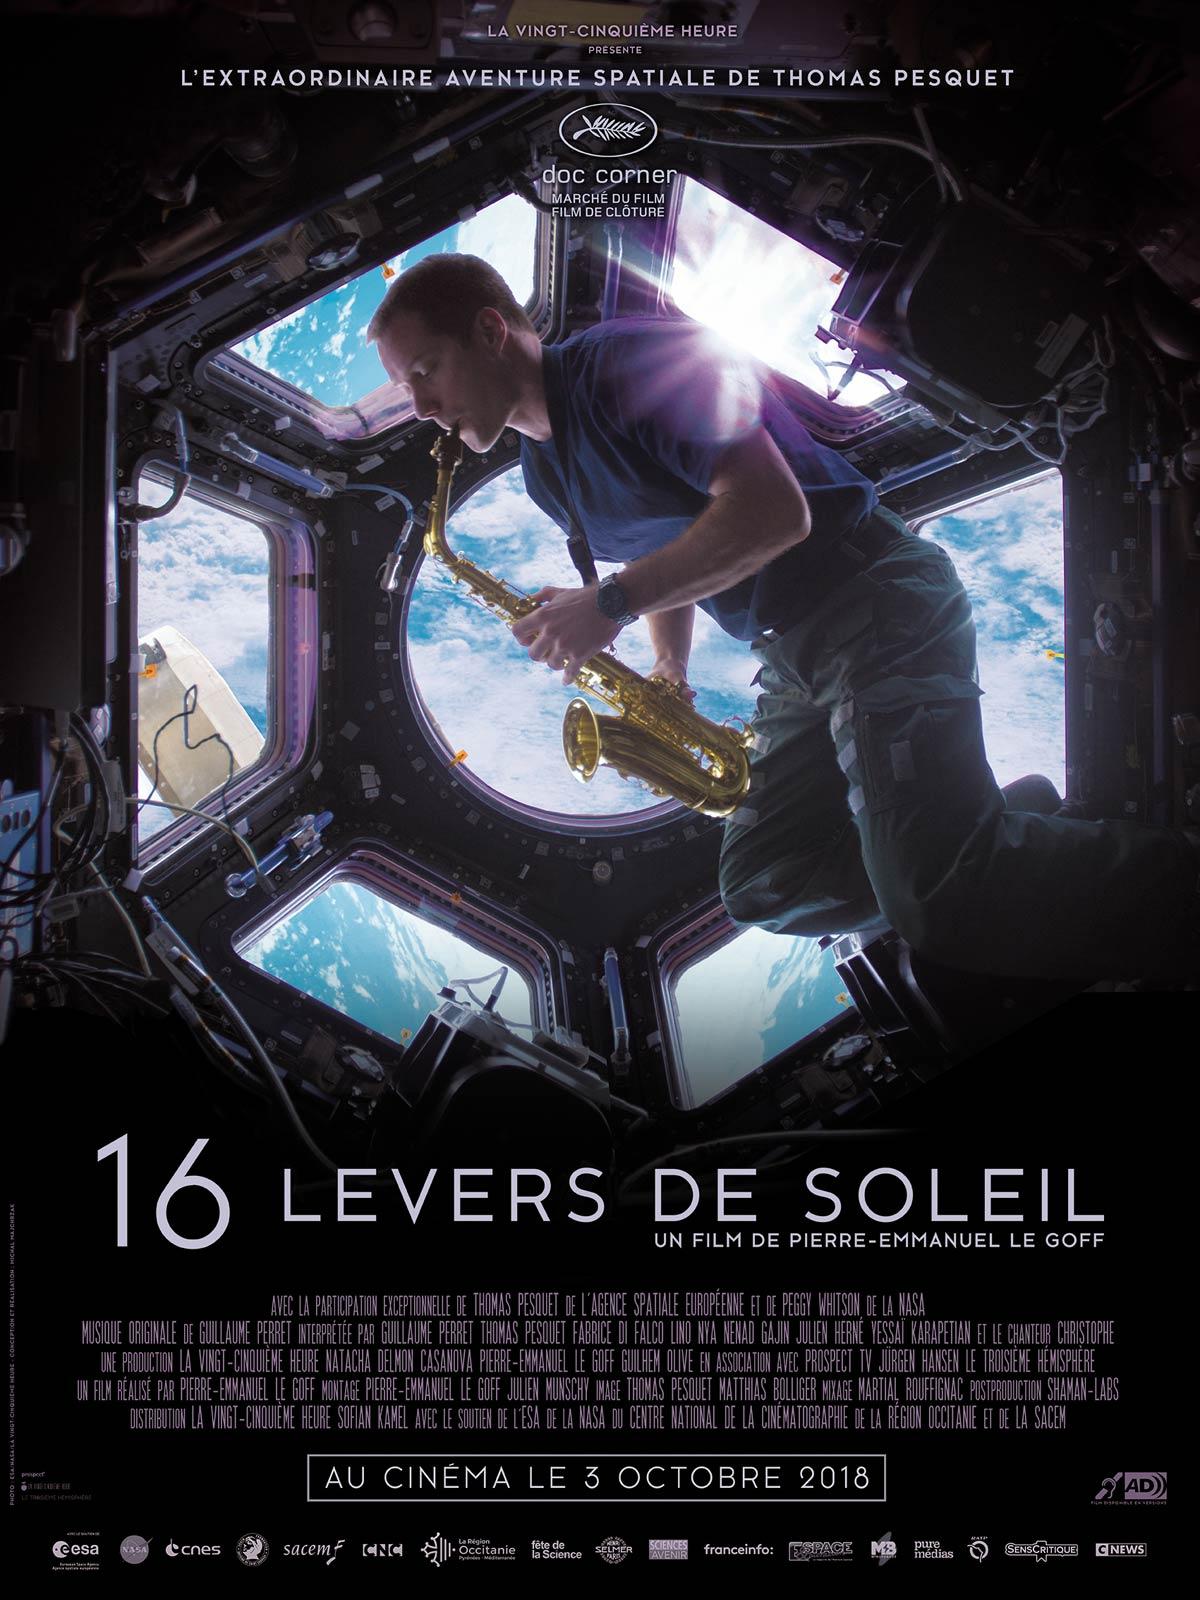 16 LEVERS DE SOLEIL